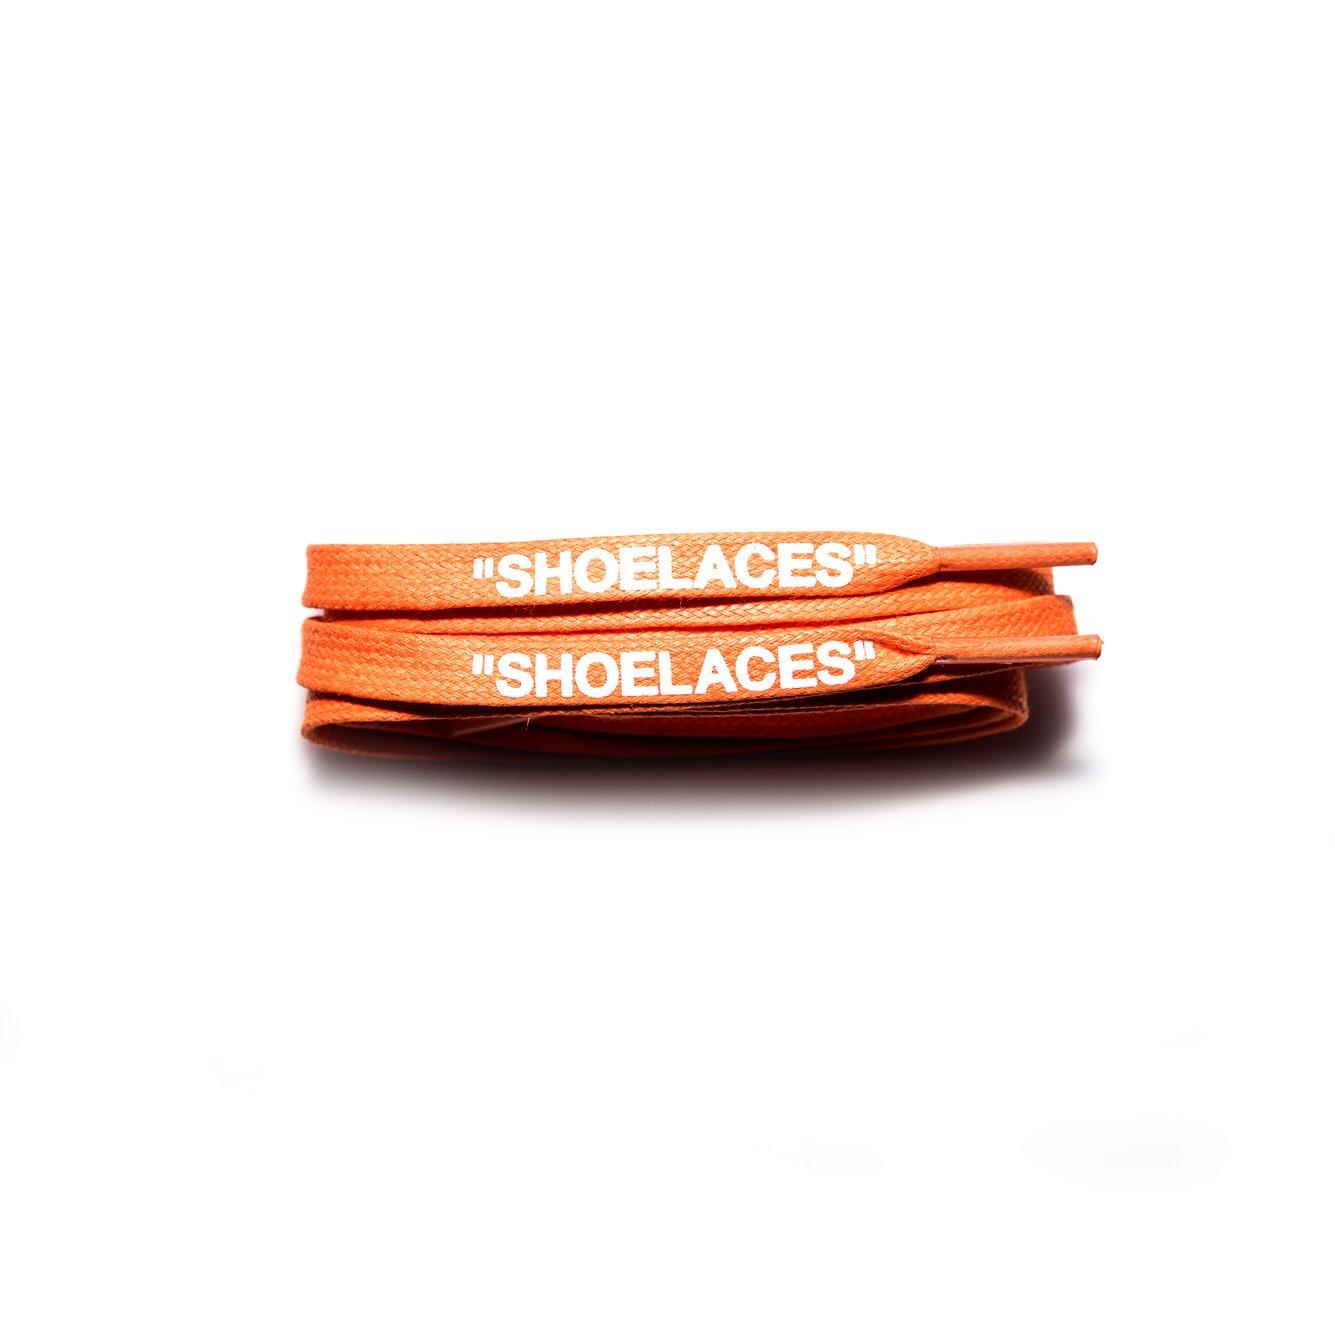 xxiii -''Shoelaces'' Custom Text Printed Shoe Laces Swap Font - Flat Cotton Waxed Design